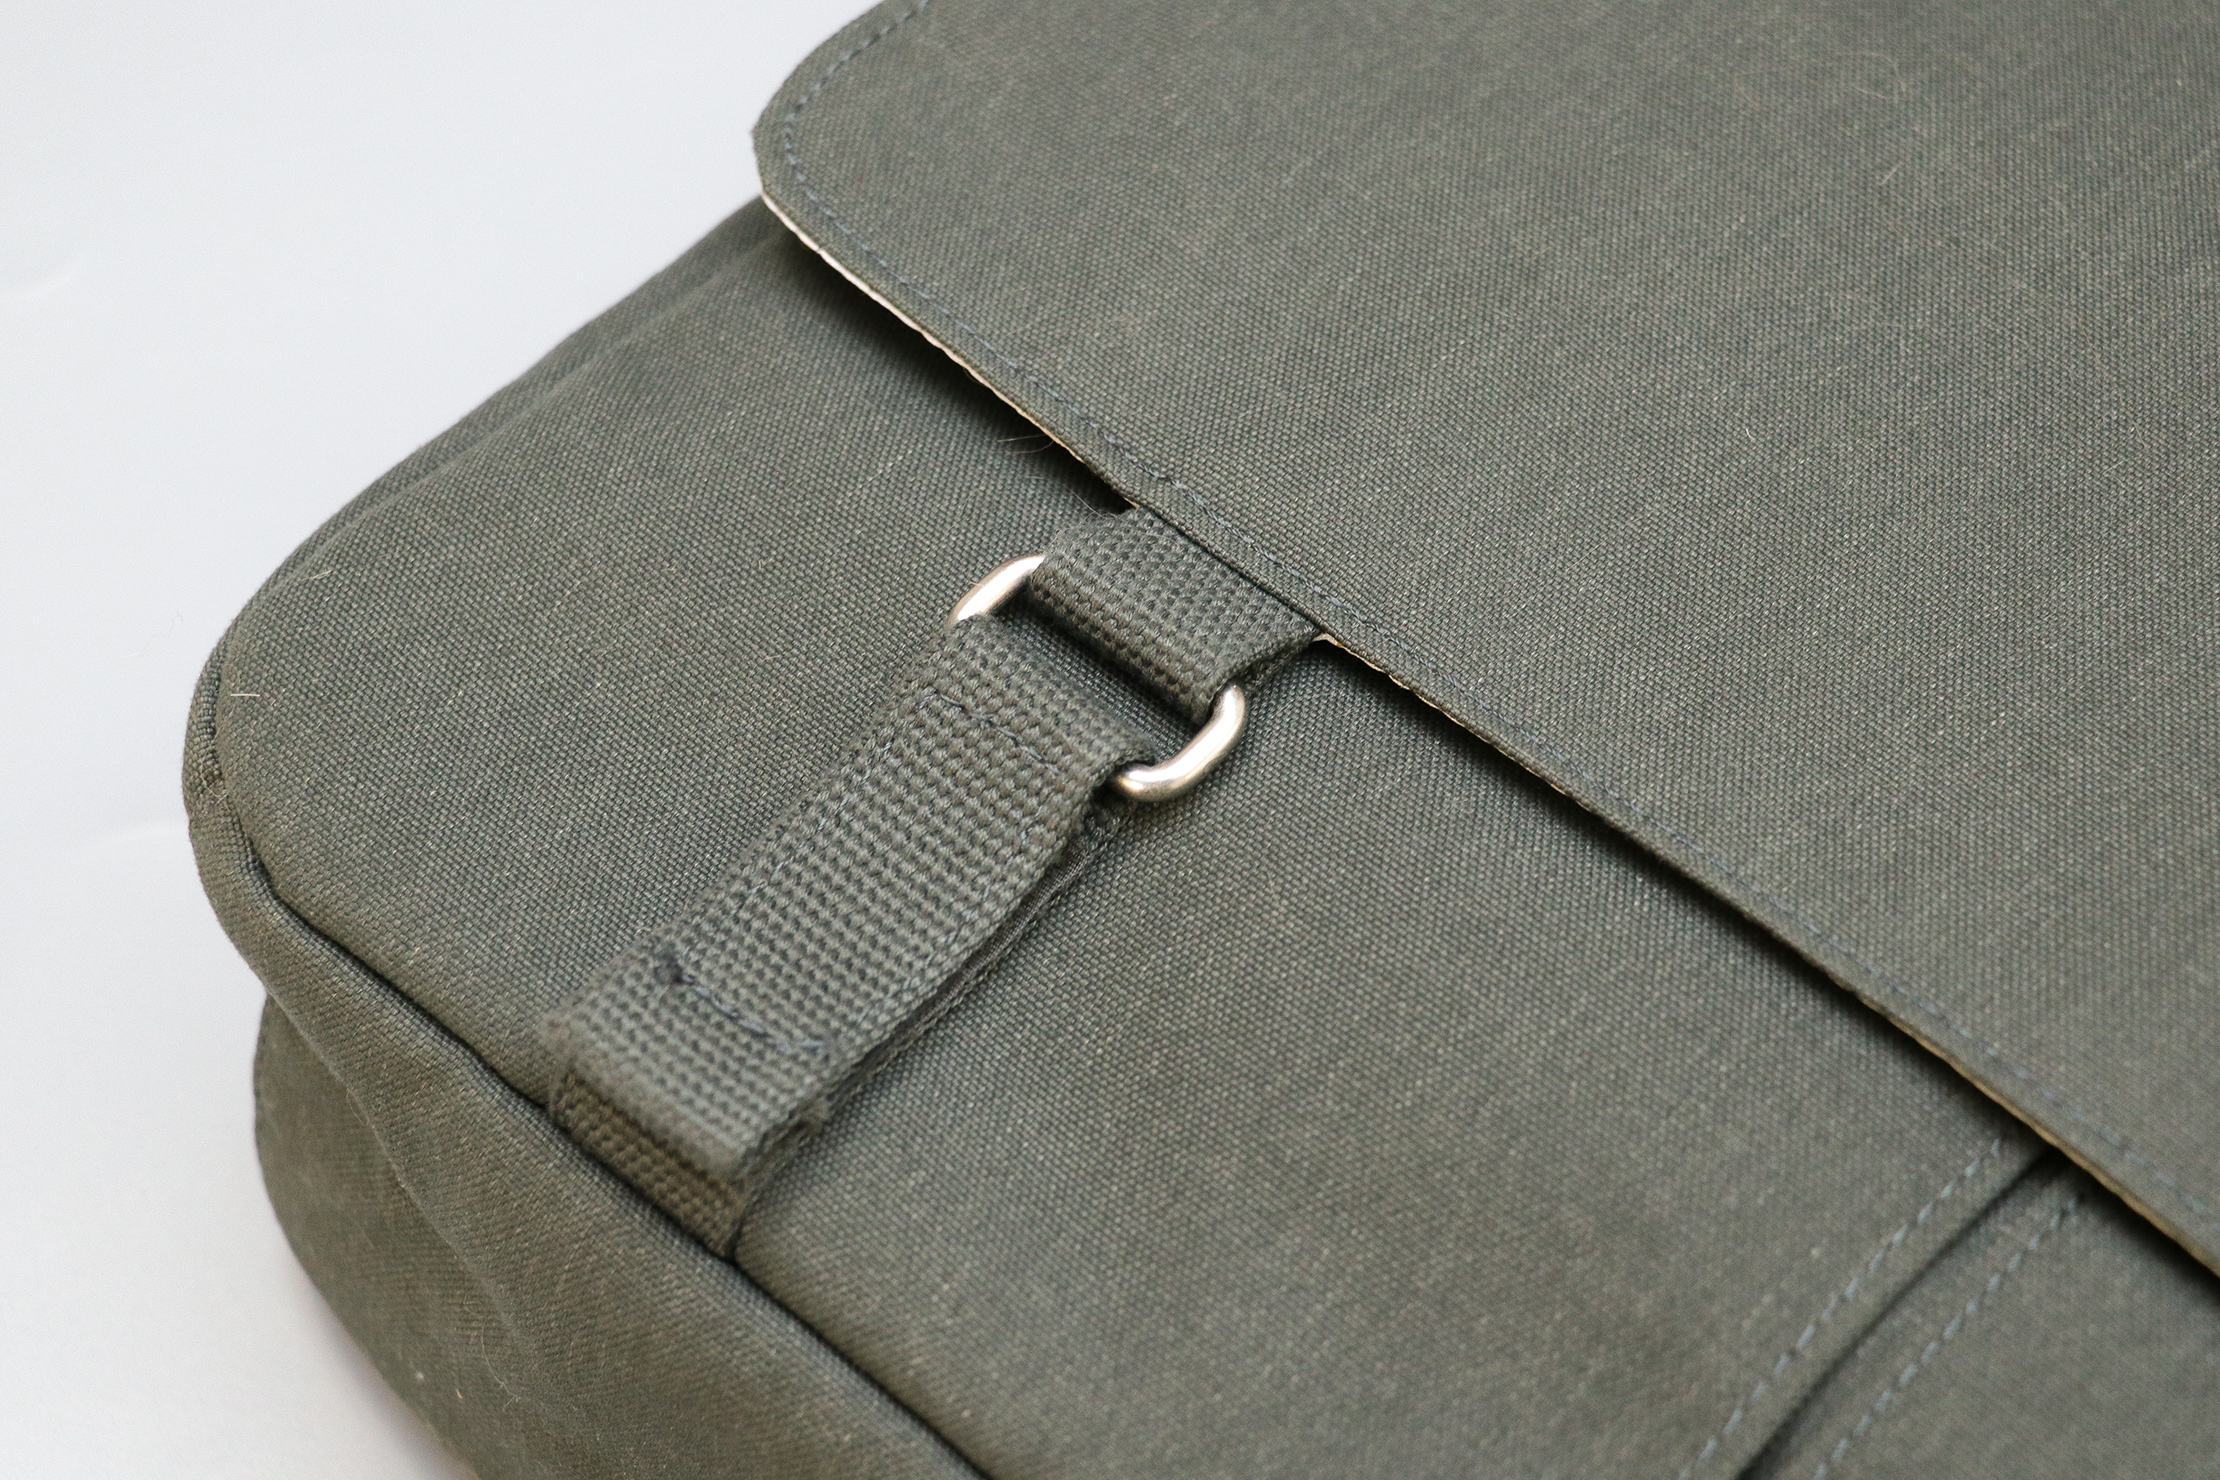 IKEA DROMSACK Messenger Bag Material